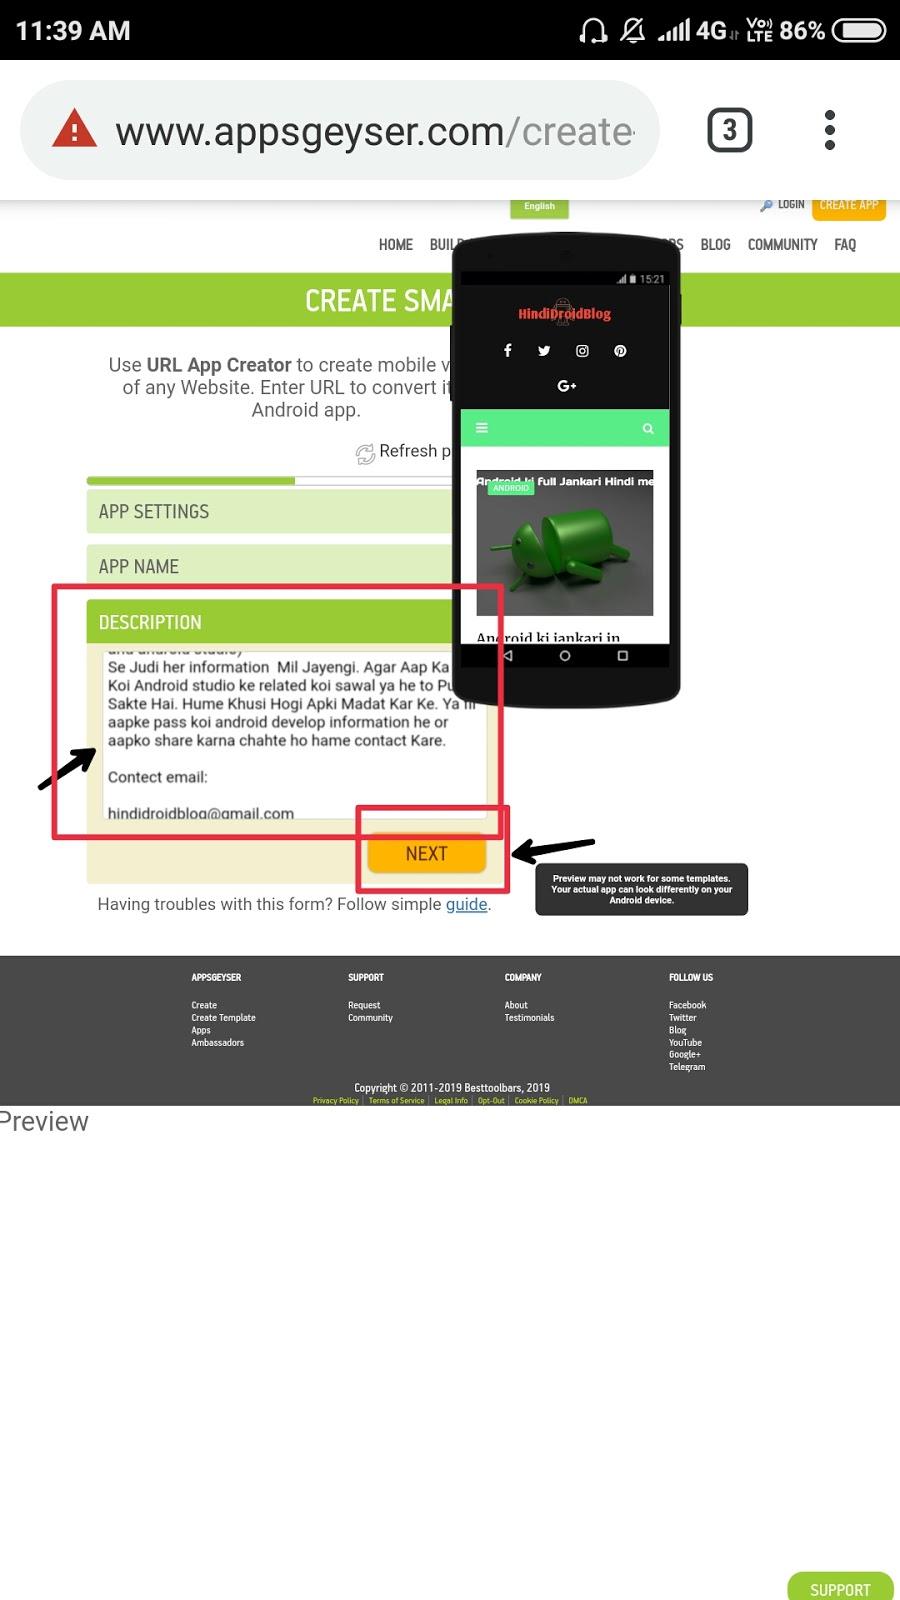 Appsgeyser App Download